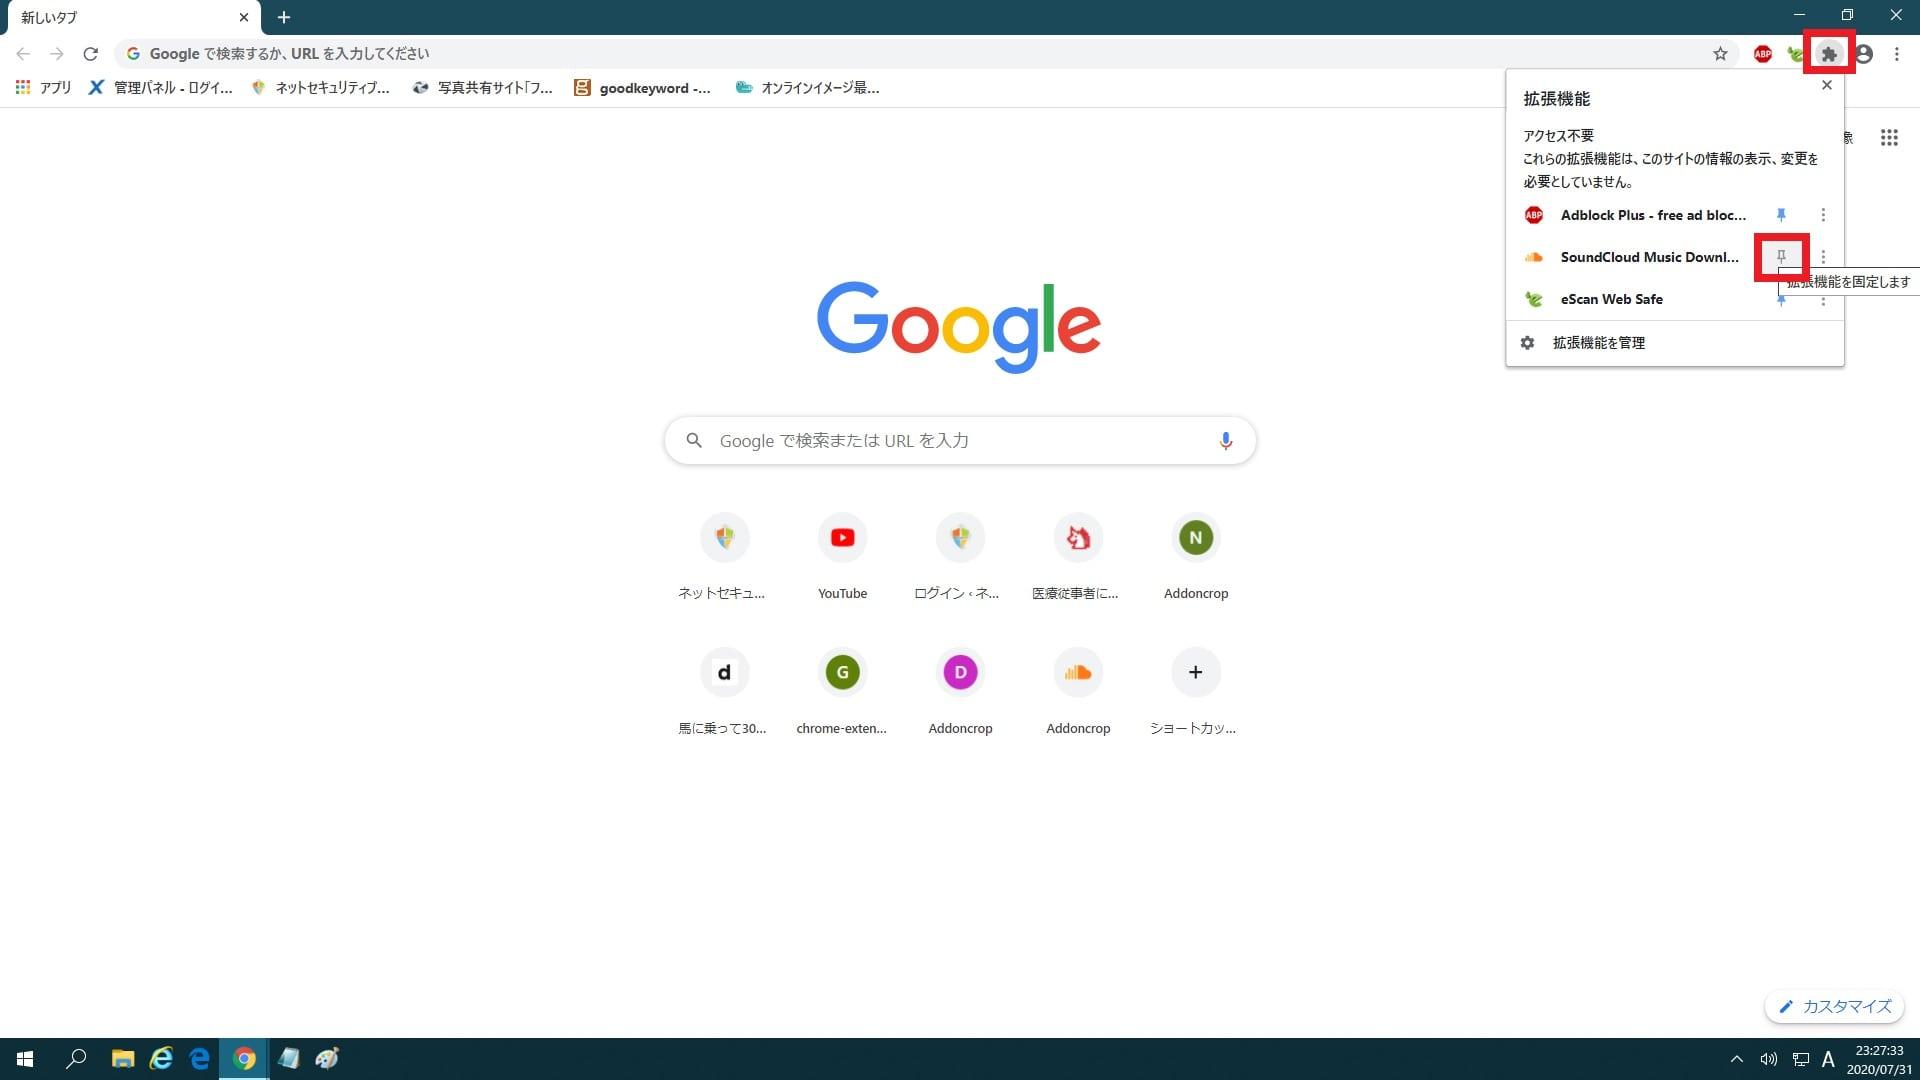 Google Chromeのアドレスバーに拡張機能のアイコンを表示する画面